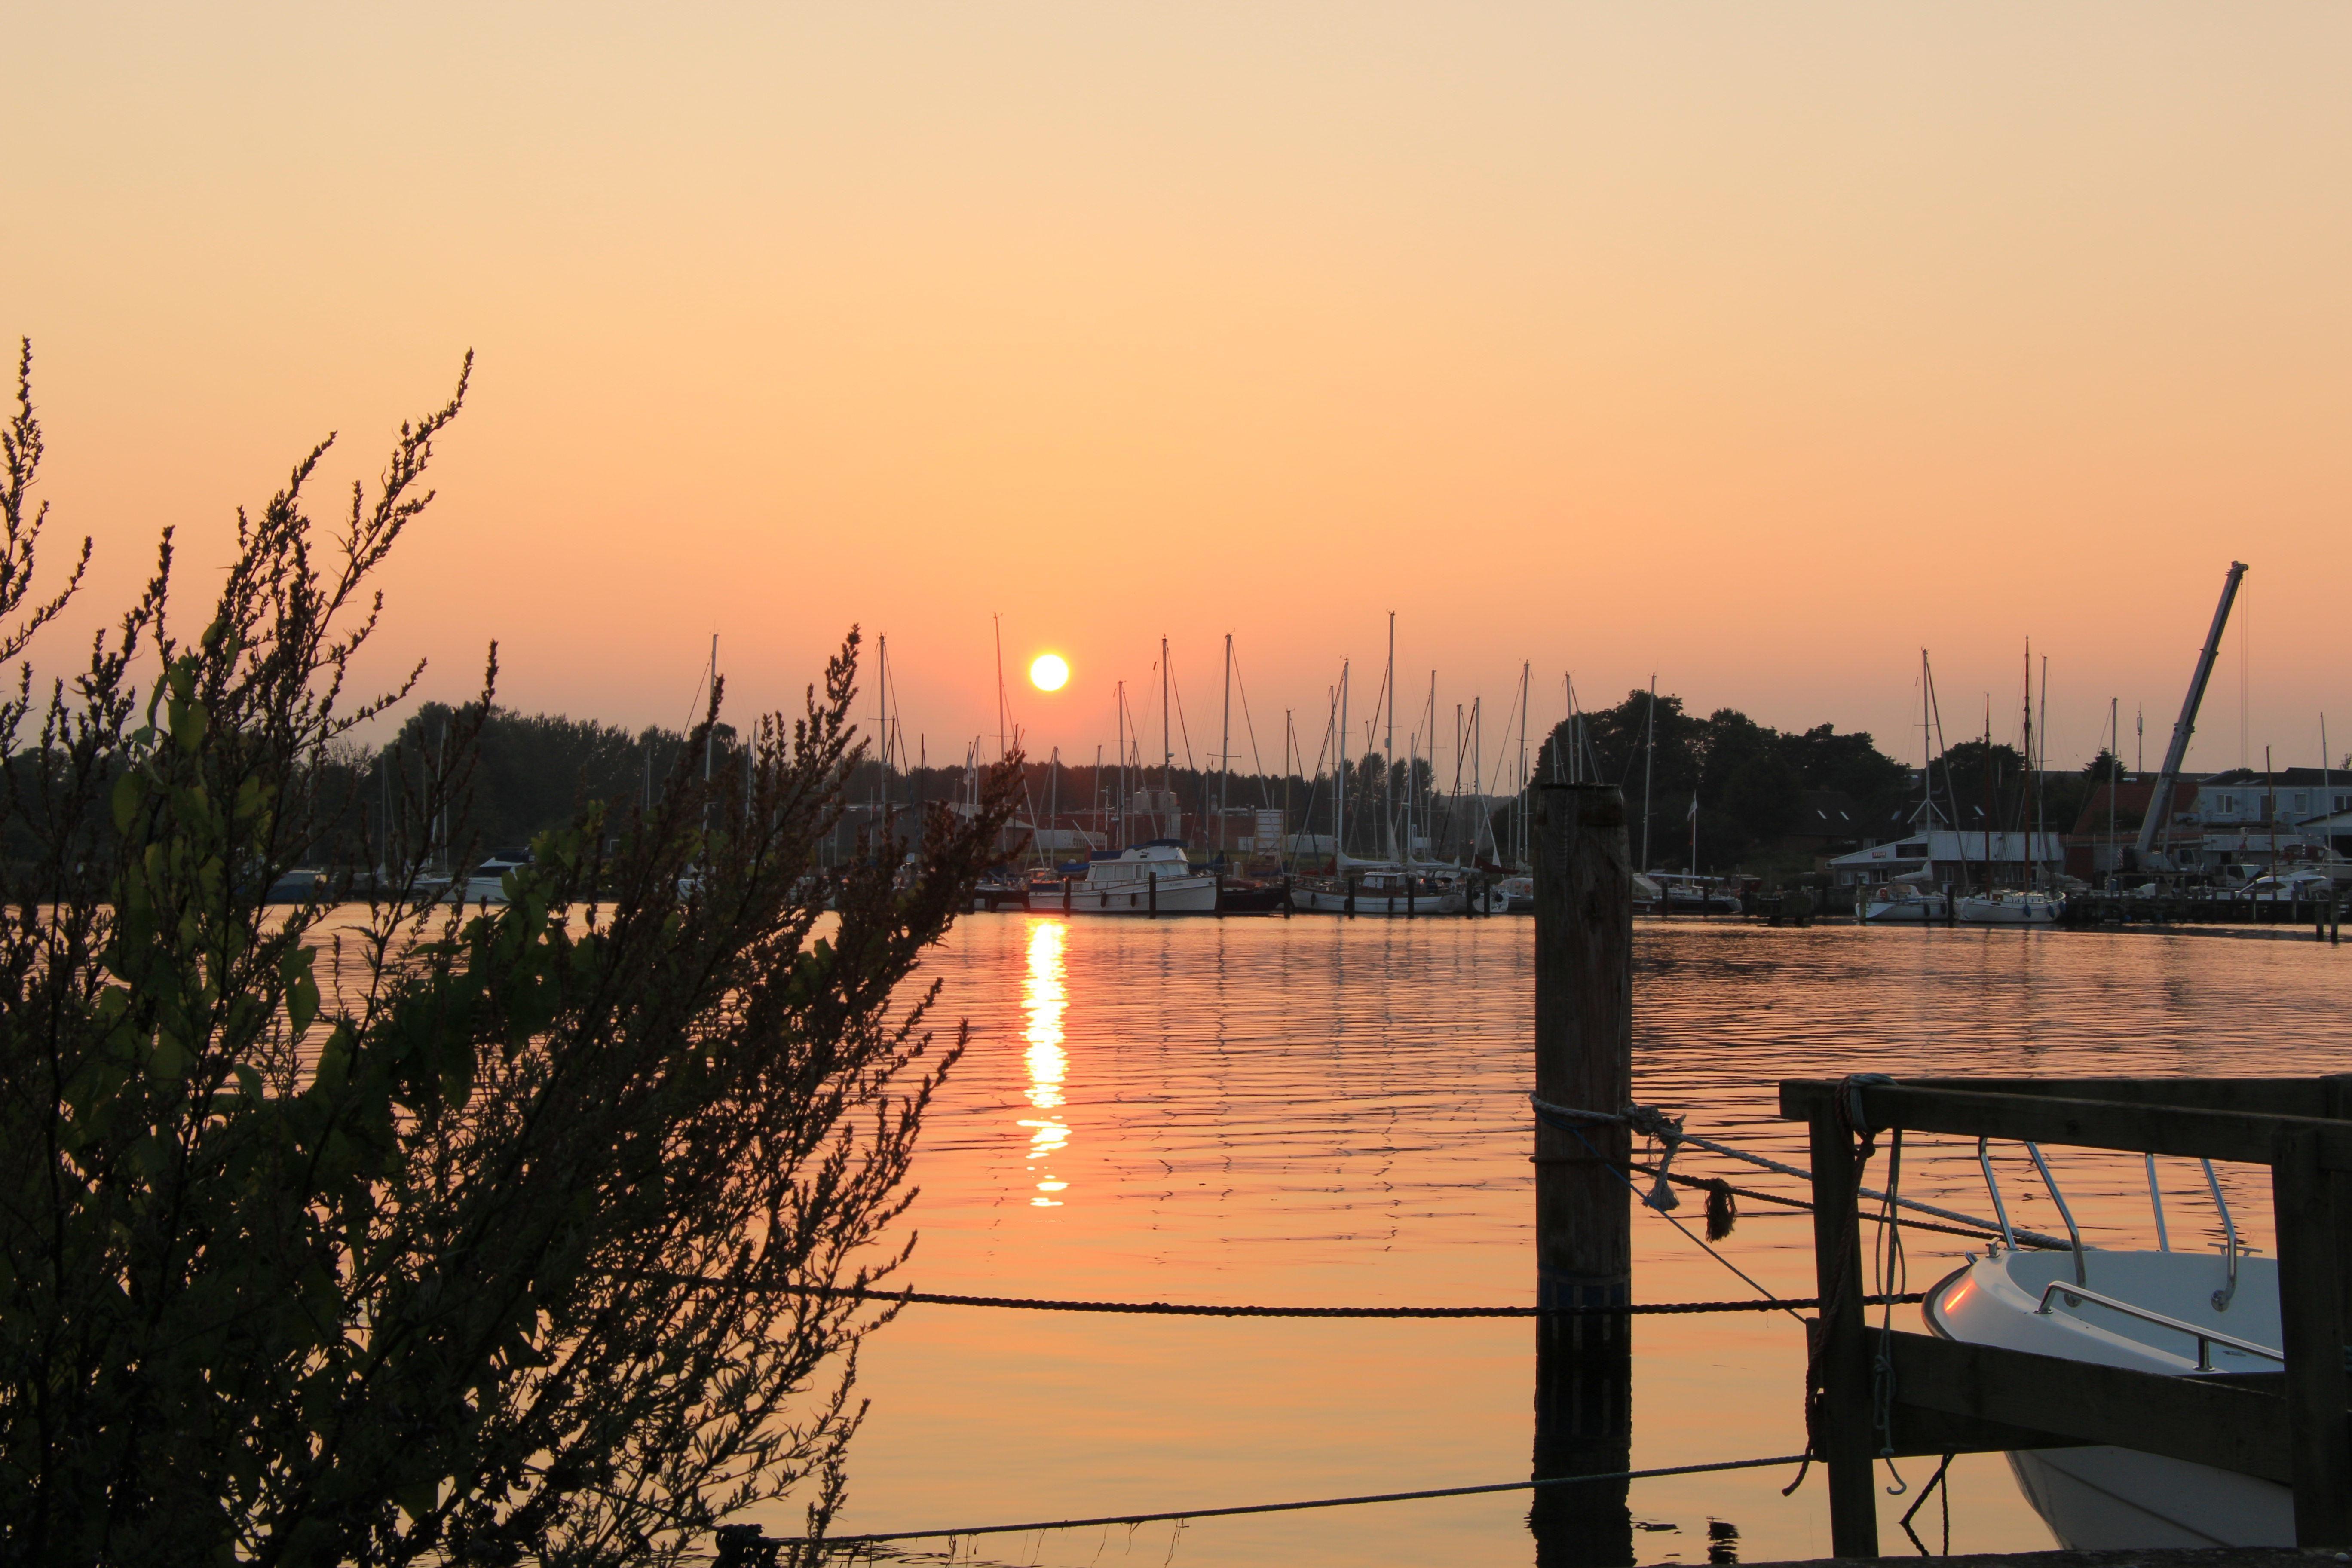 Peaceful Sunset - Egernsund, September 2016 (Denmark). #weather #sonderborg #jylland #danmark #fishing #view #træning #løb #sport #design #jatak #kbh #københavn #fyn #denmark #sunset #travel #outdoor #art #camping #sommer #jagt #awesome #like4like #copenhagen #fun #phaseone #sky #like4like #post